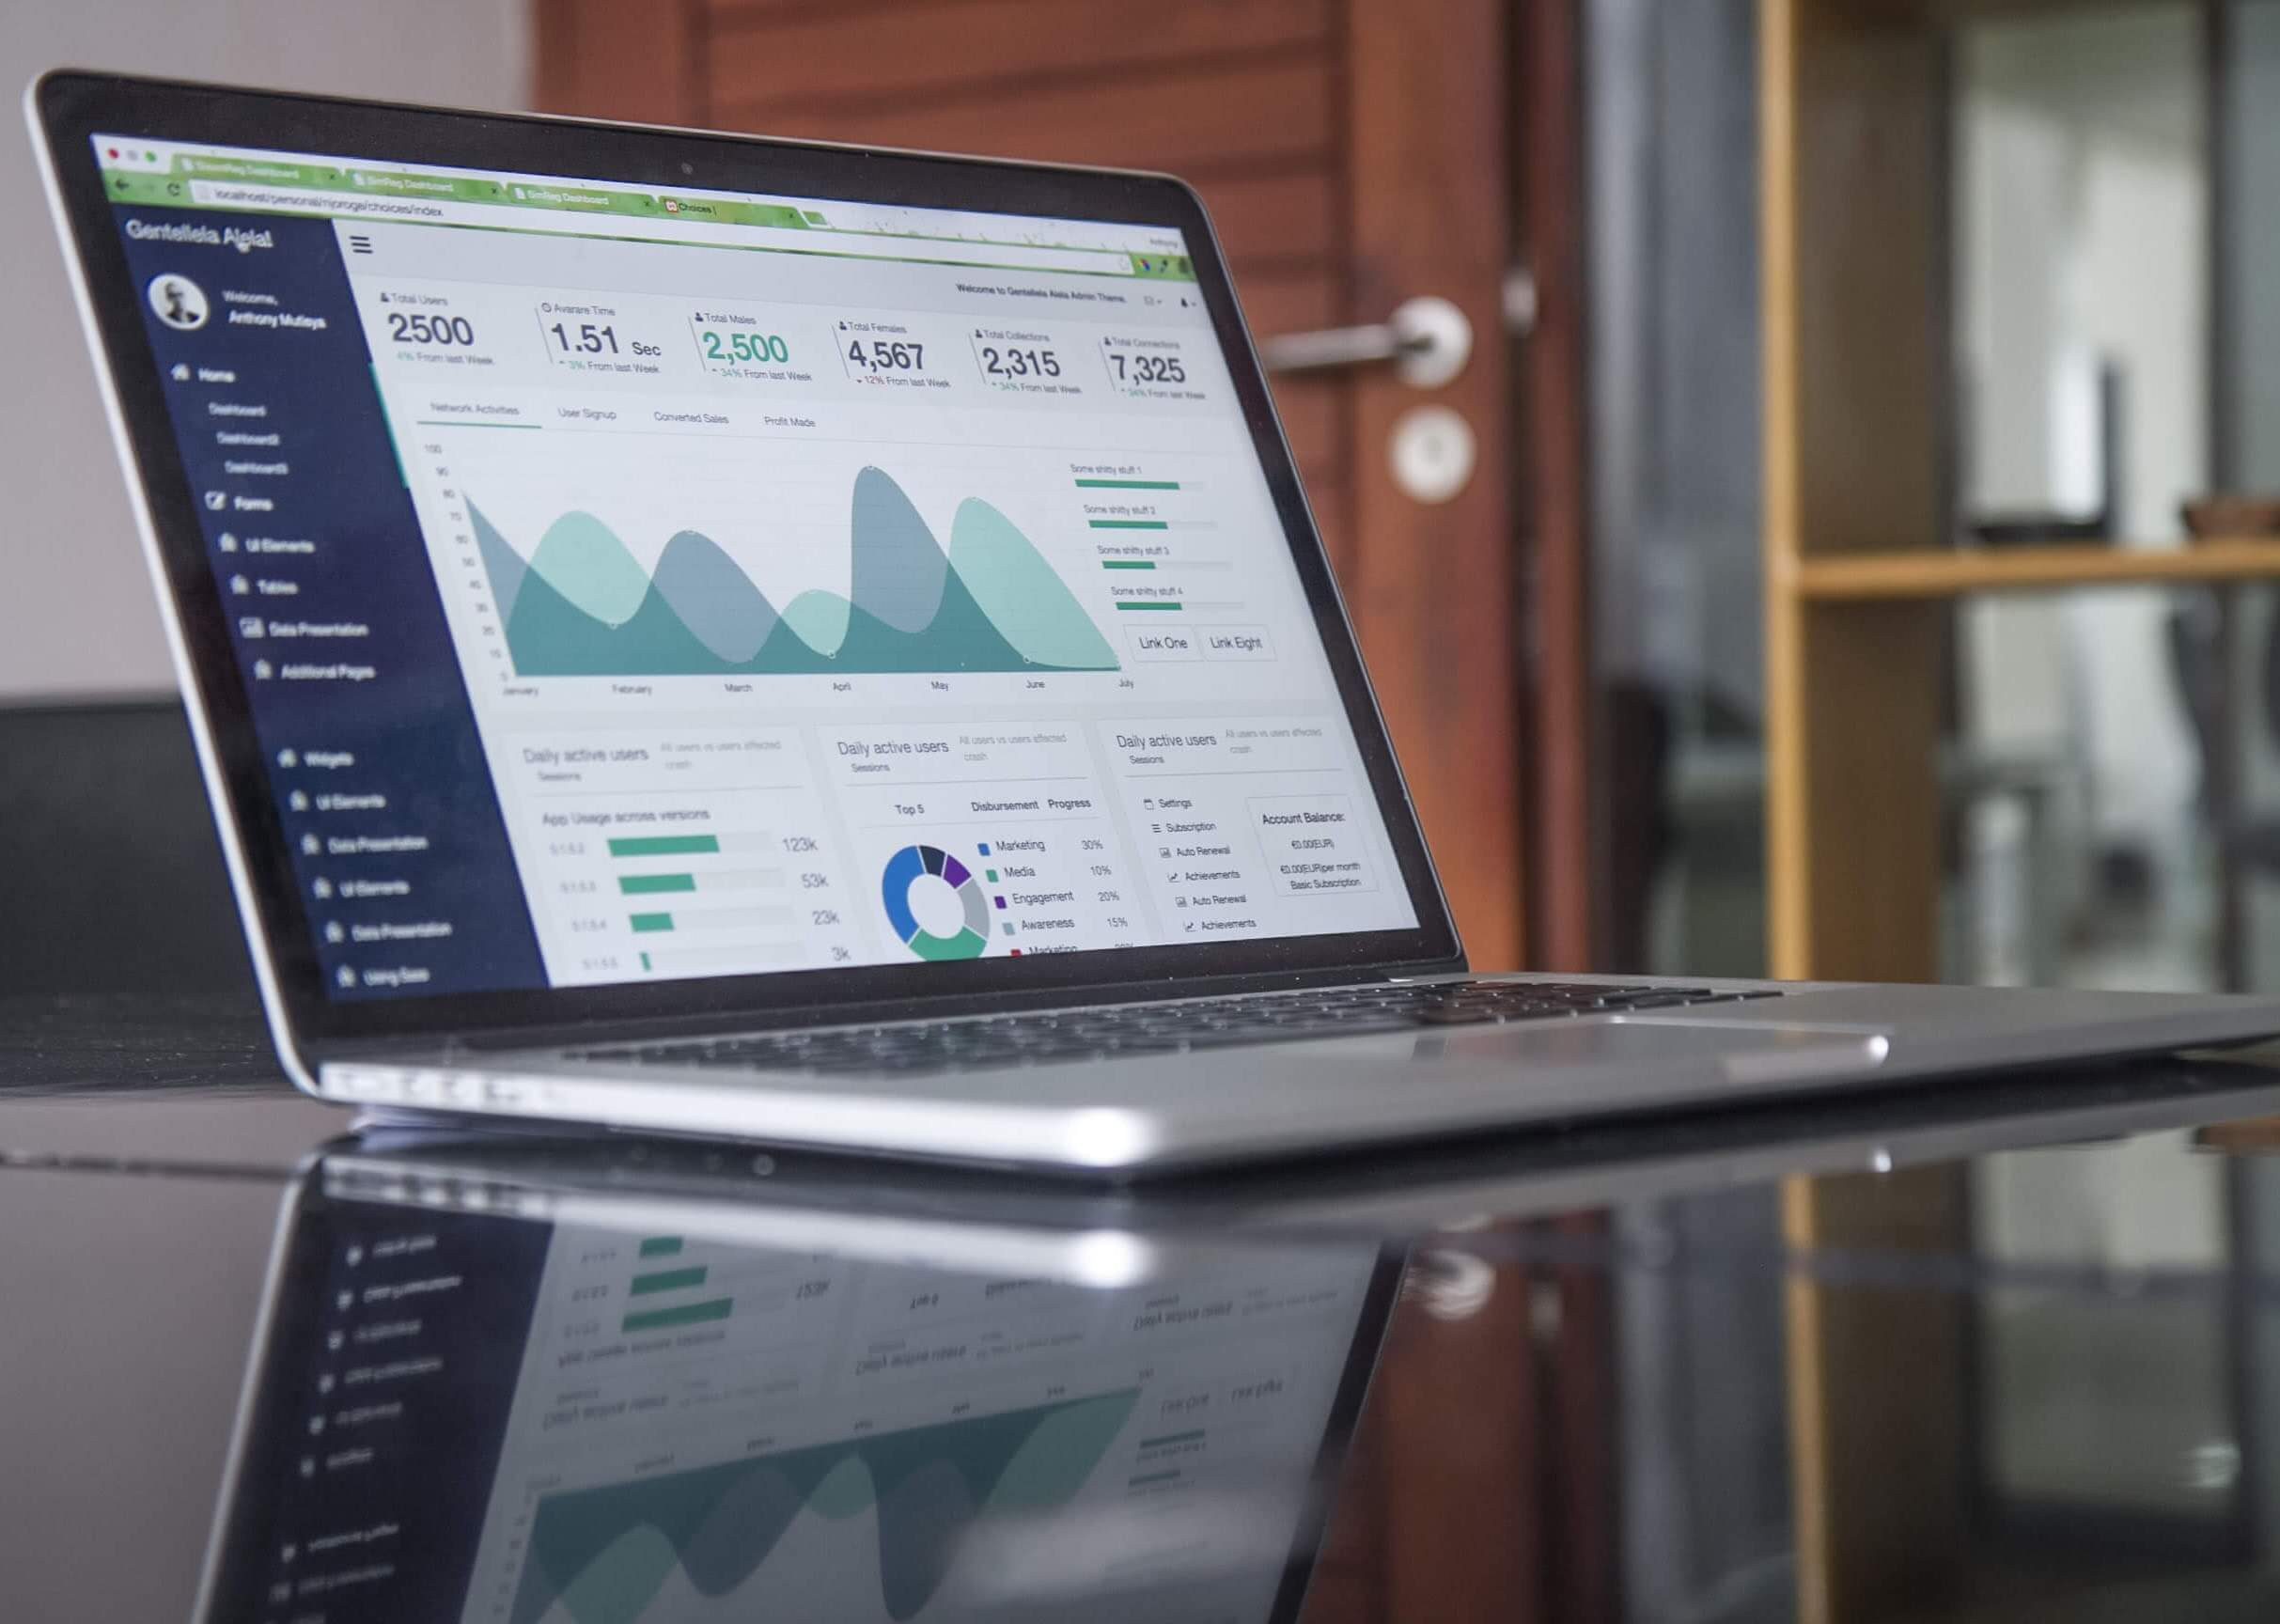 Statisctics on a laptop computer